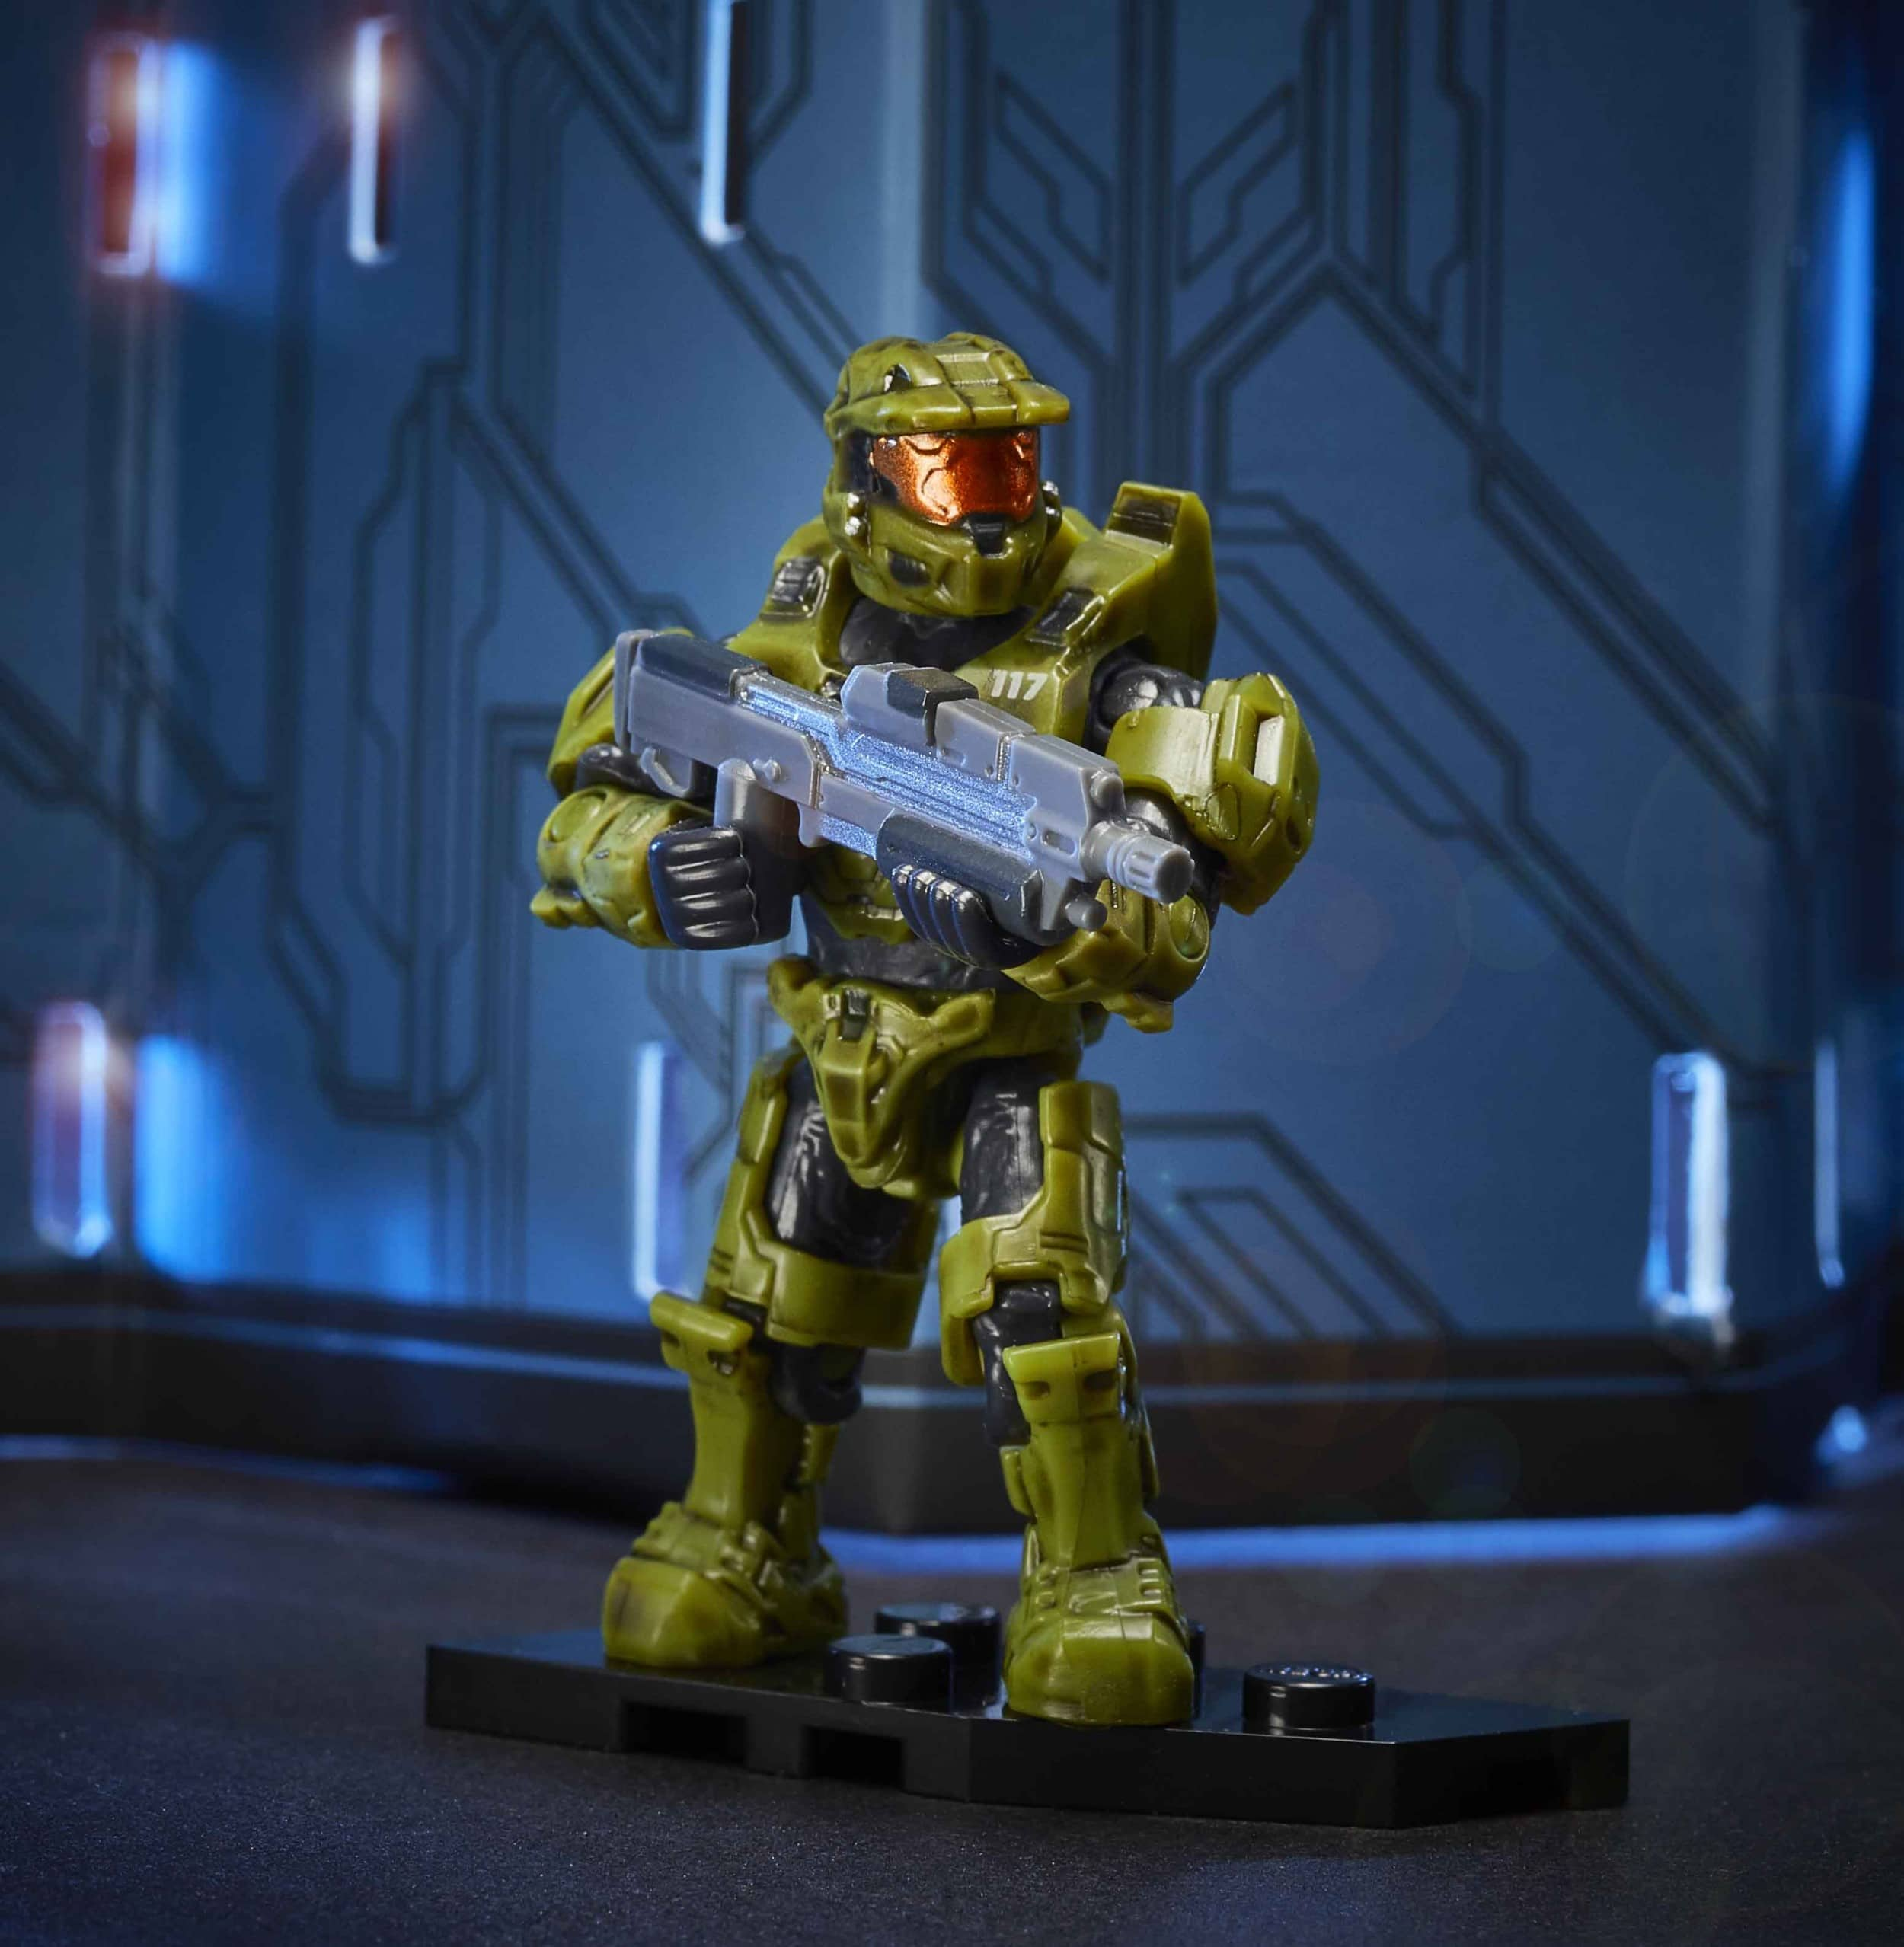 MEGA Construx reveals Halo Master Chief Collection as a Comic-Con exclusive 13